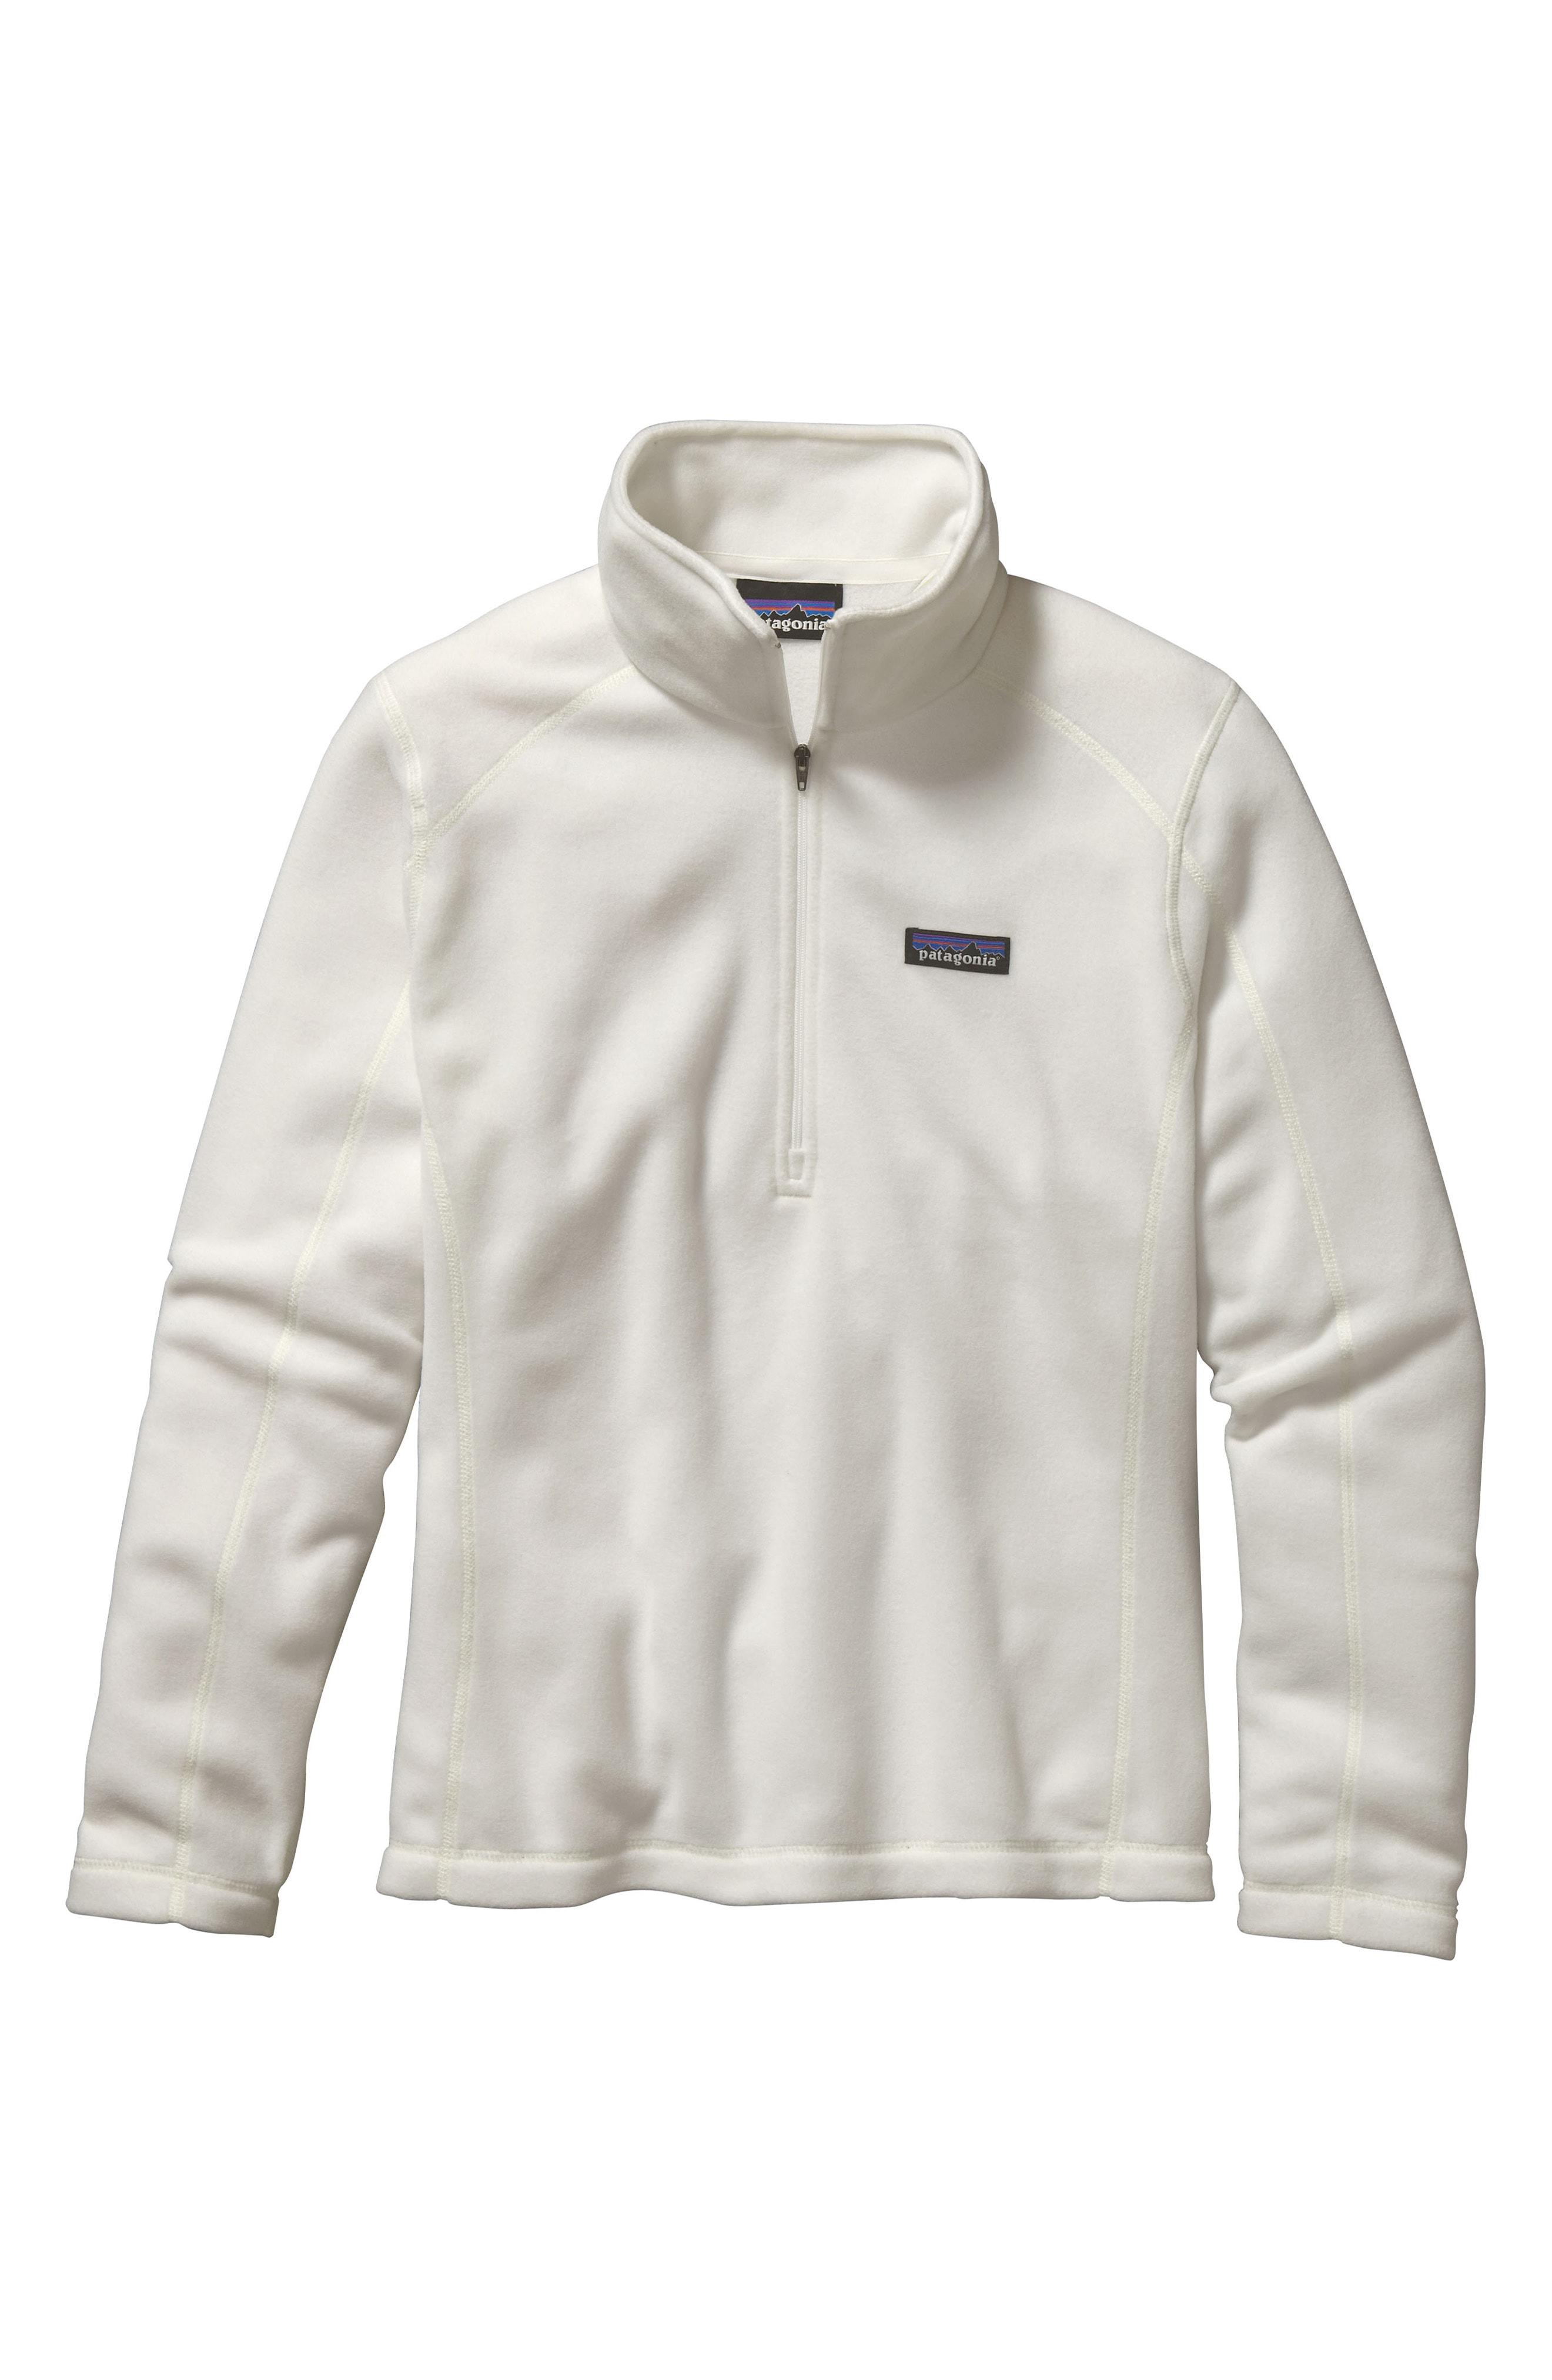 Patagonia Micro D Quarter-Zip Fleece Pullover In Birch White